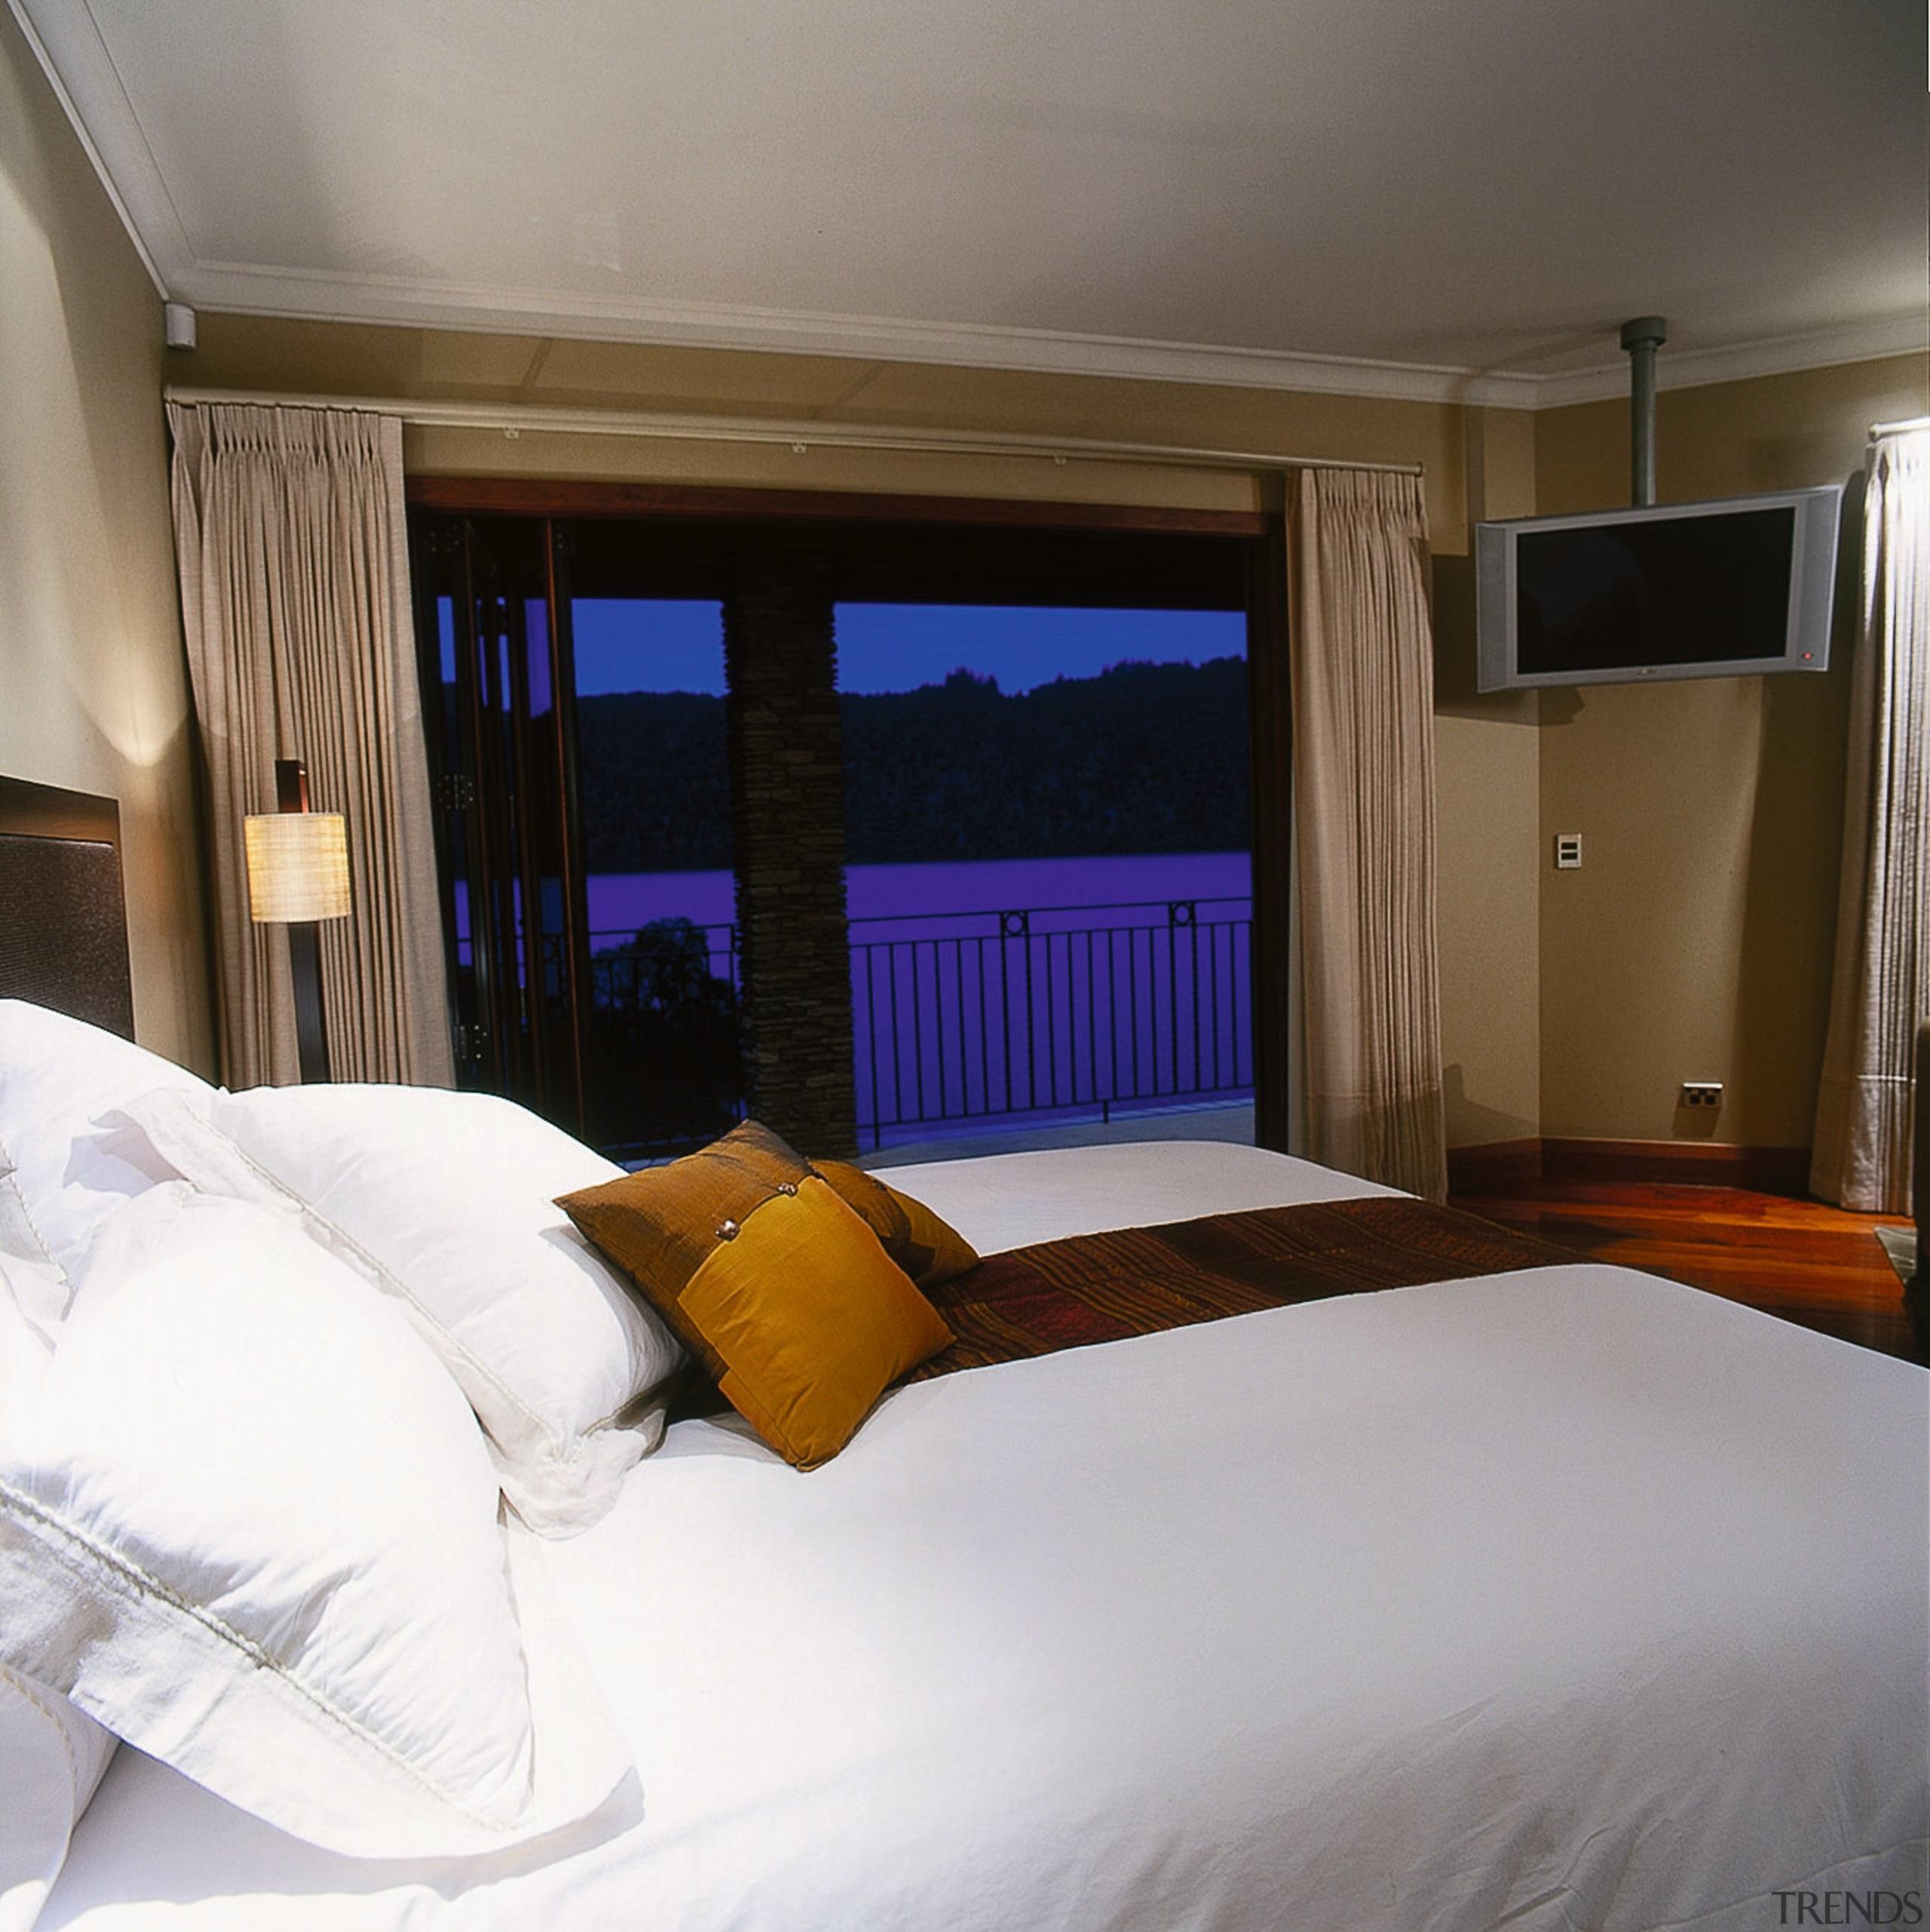 Inner view of the master bedroom - Inner bed, bed frame, bedroom, ceiling, floor, home, interior design, real estate, room, suite, window, gray, brown